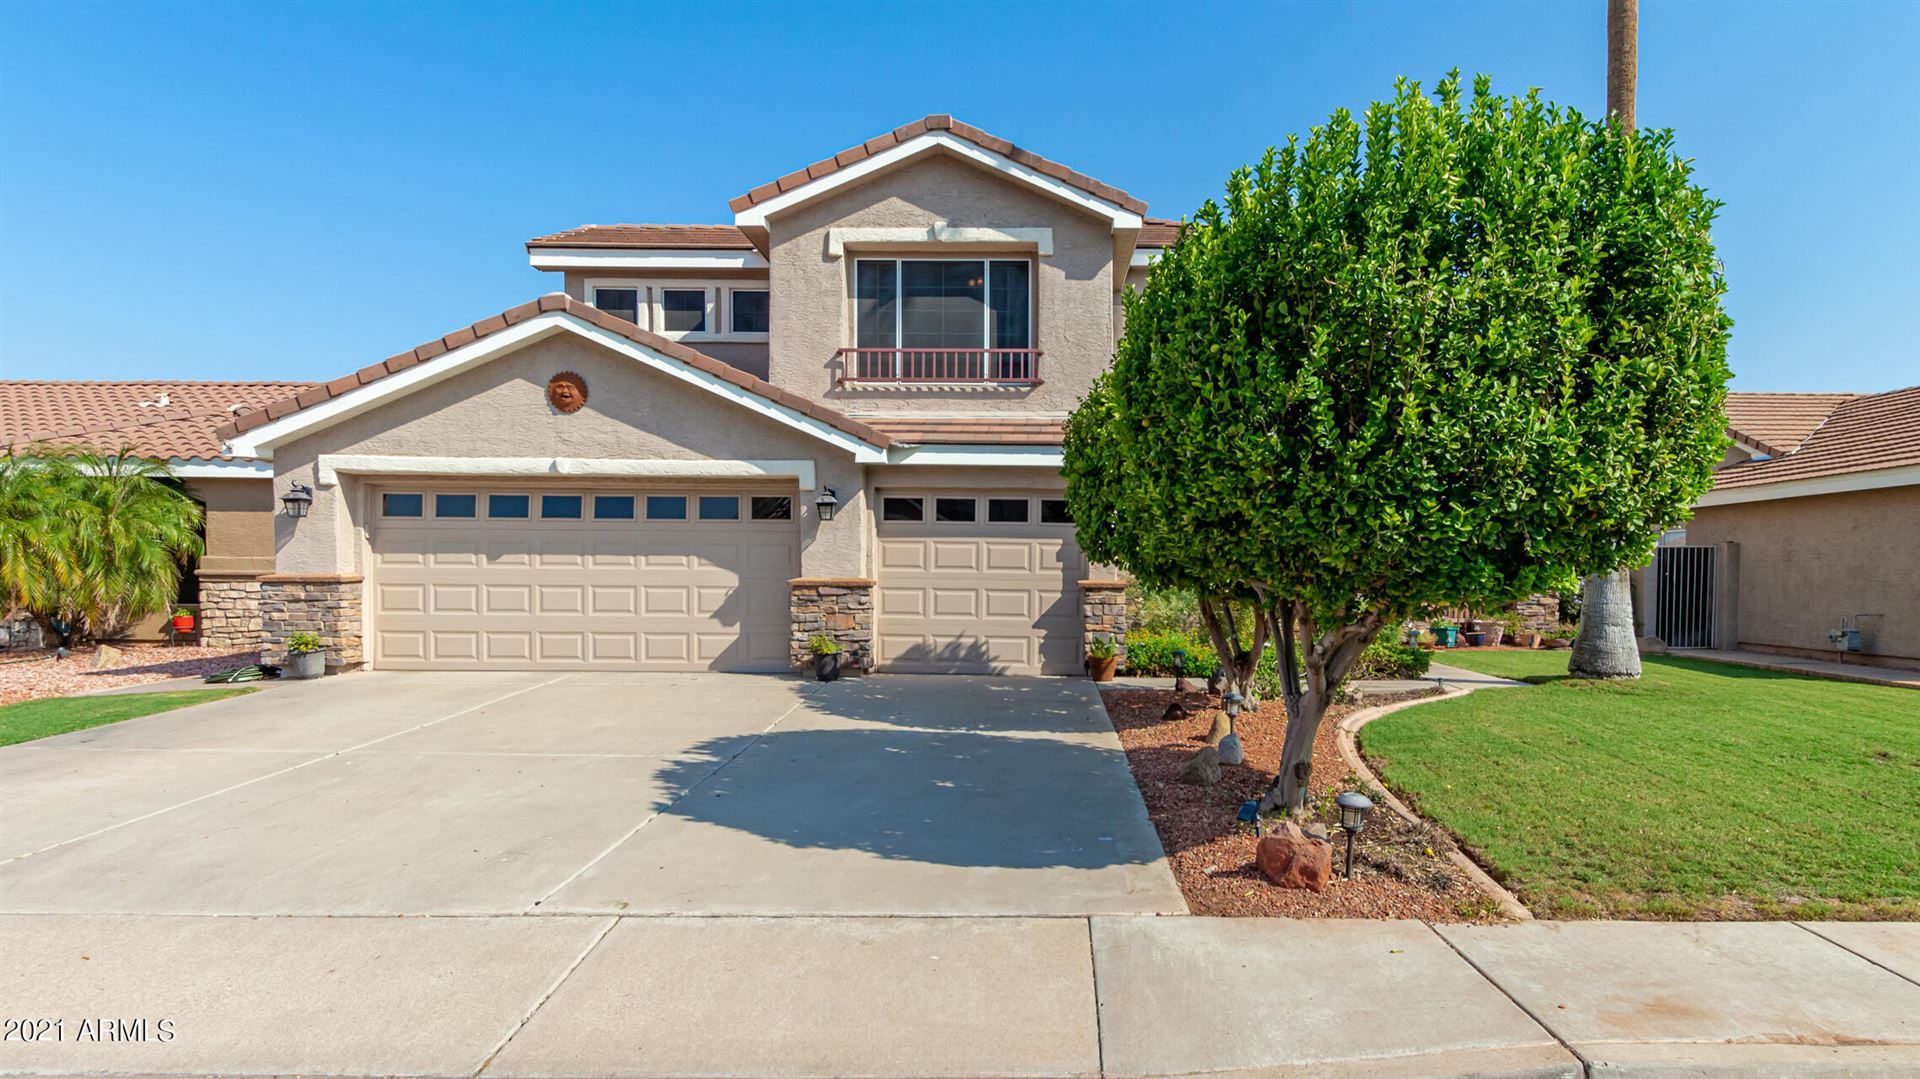 Photo of 962 W JUANITA Avenue, Gilbert, AZ 85233 (MLS # 6295606)